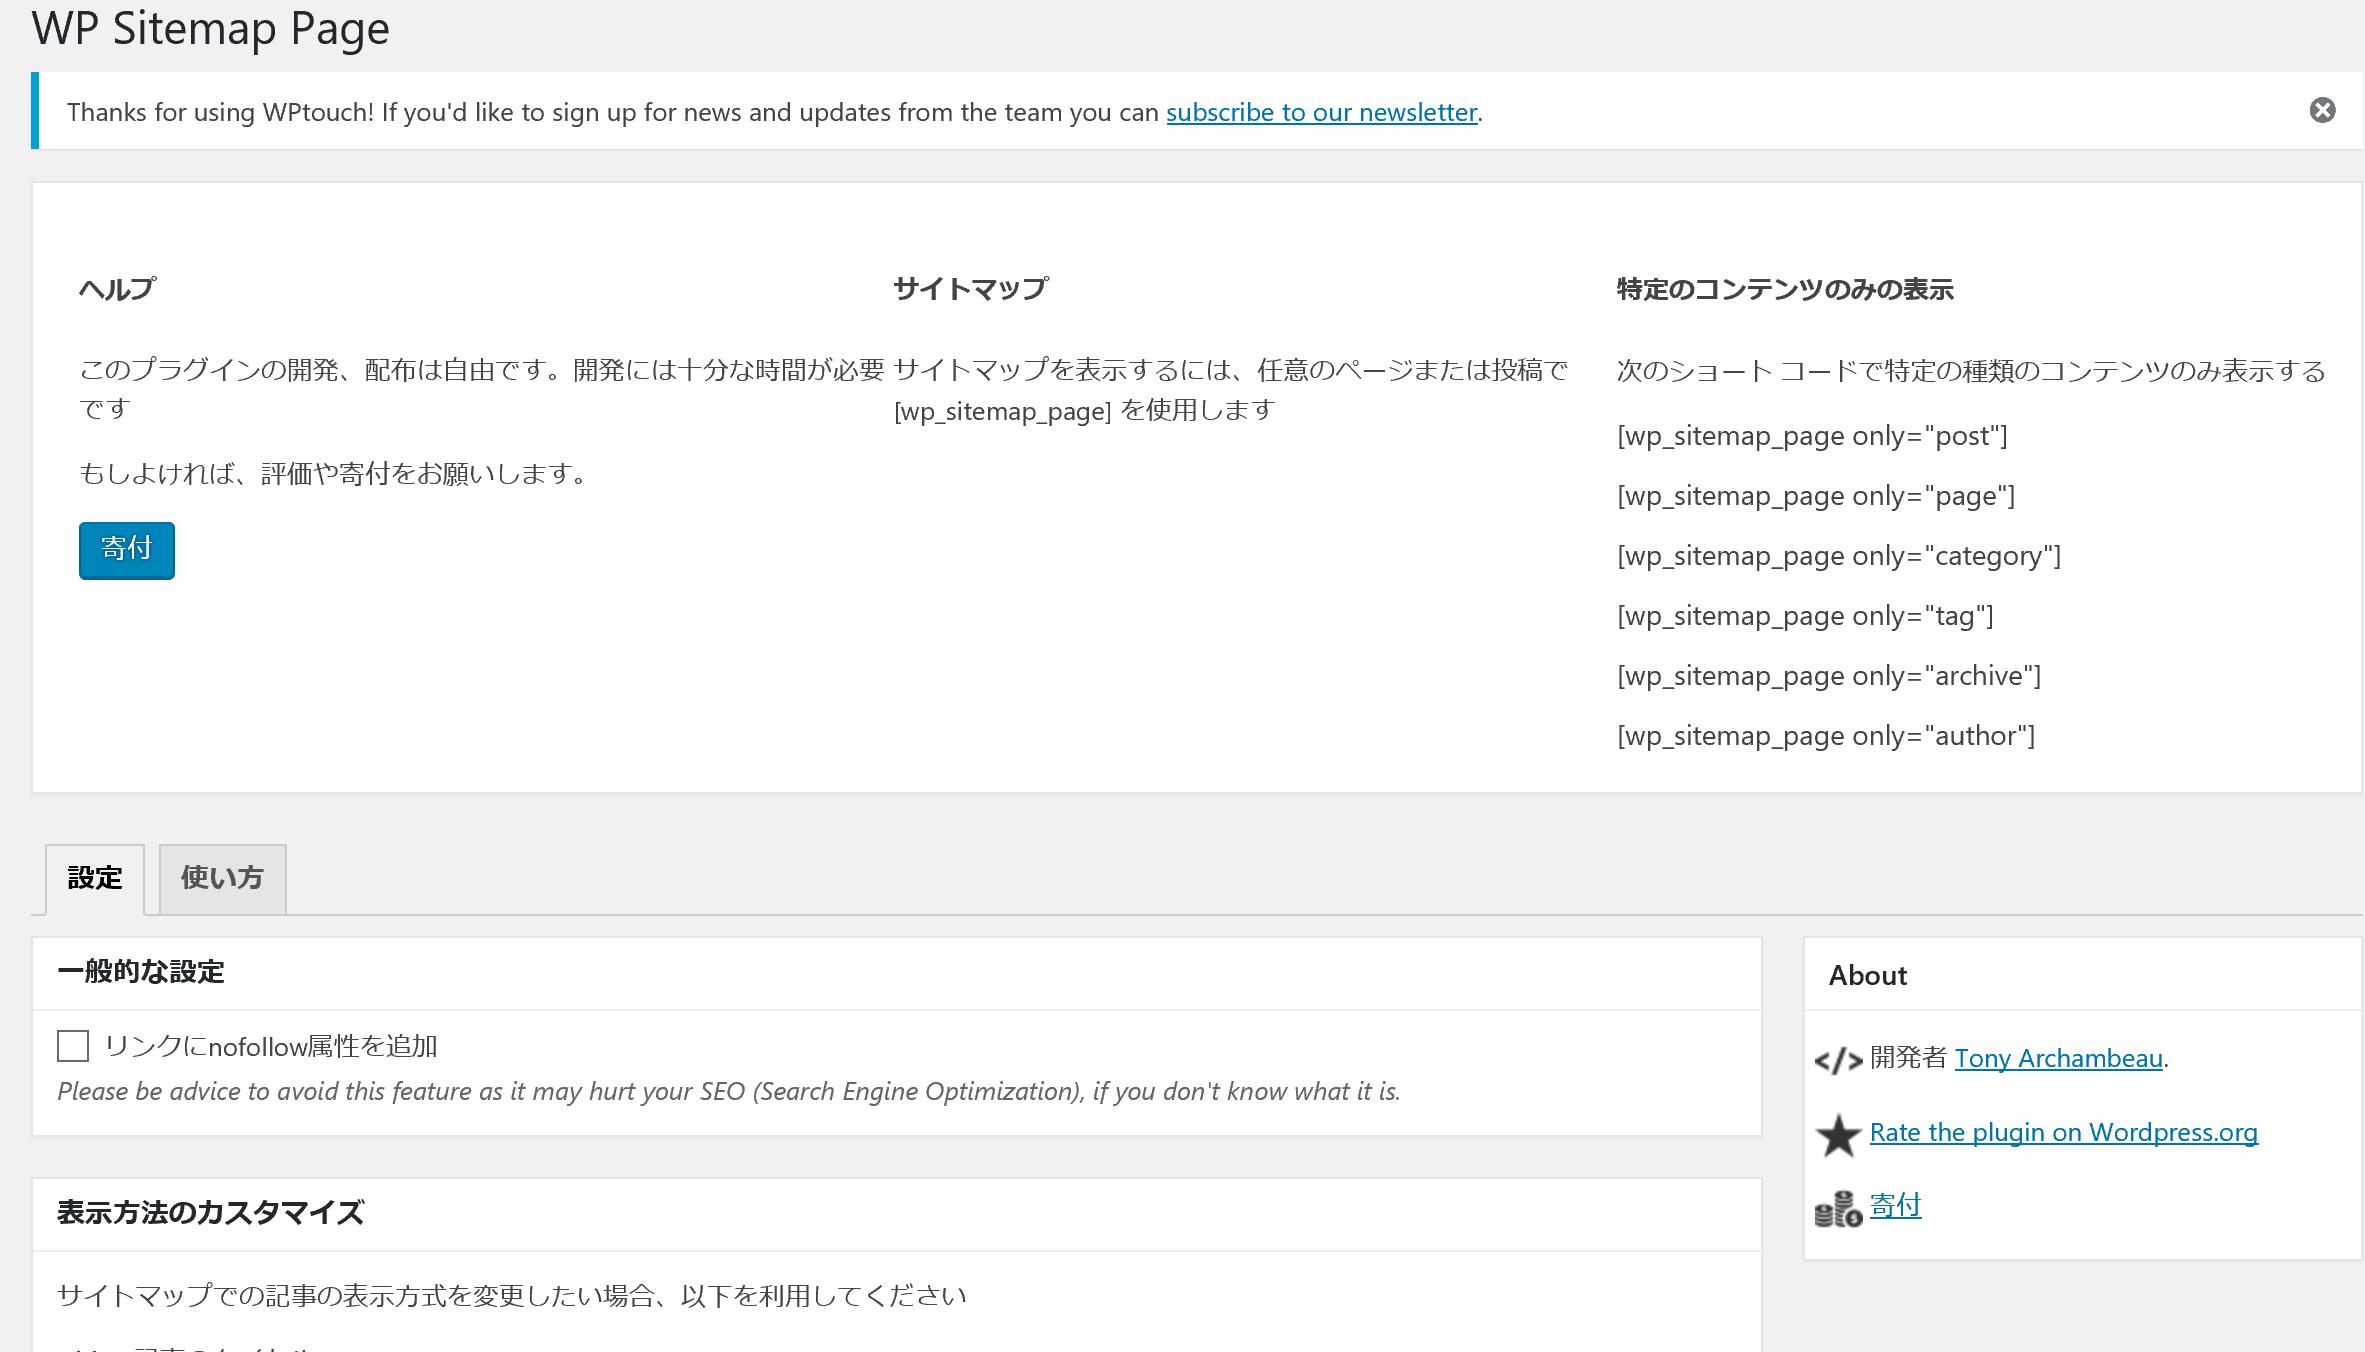 WP Sitemap Page setting - WordPressのサイトマップの作成方法!おすすめプラグイン4つも紹介